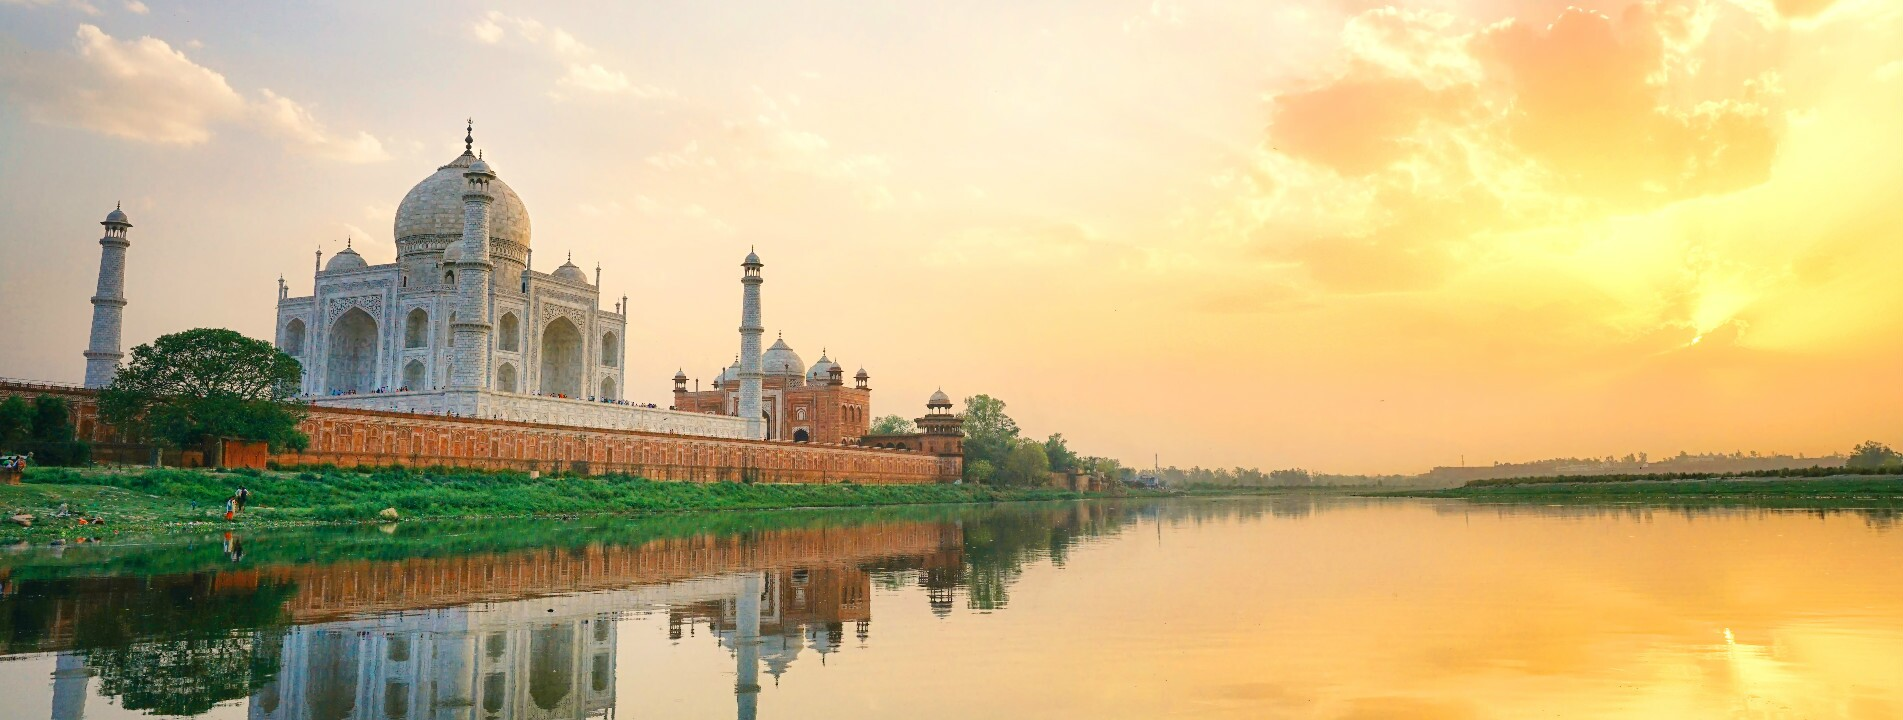 11-Day Inida Highlights and Goa Honeymoon Trip